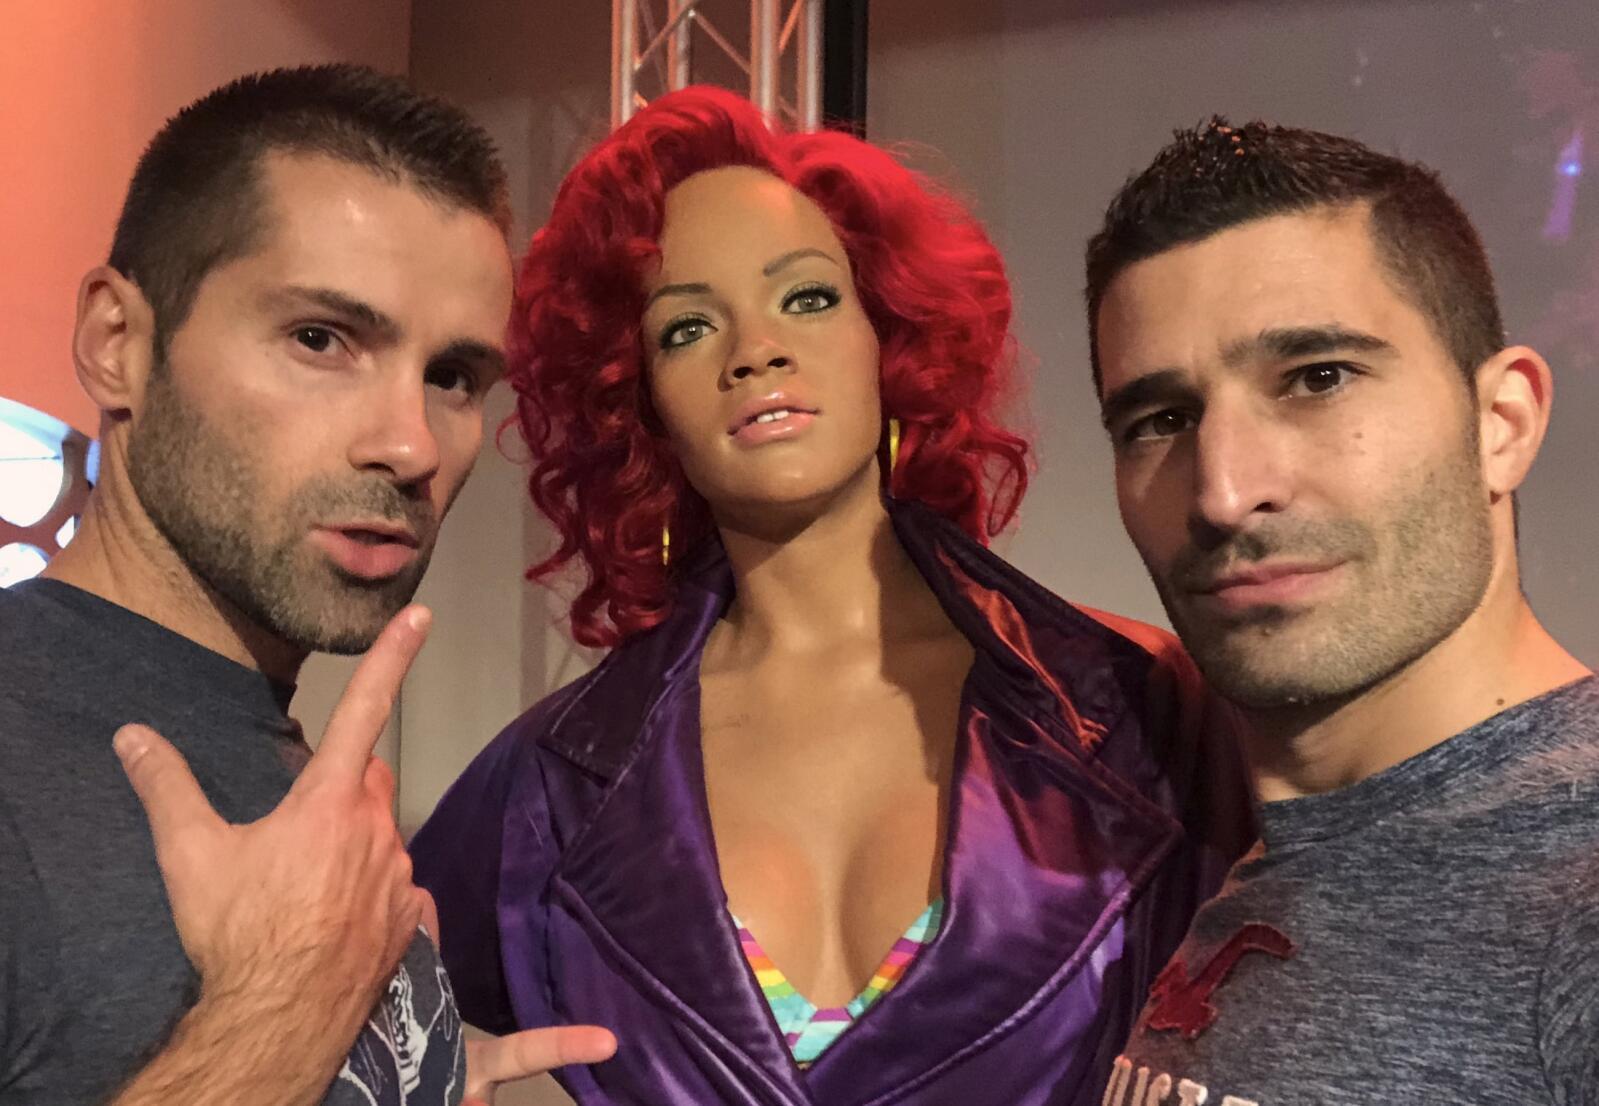 Rihanna gay icon at Madame Tussauds